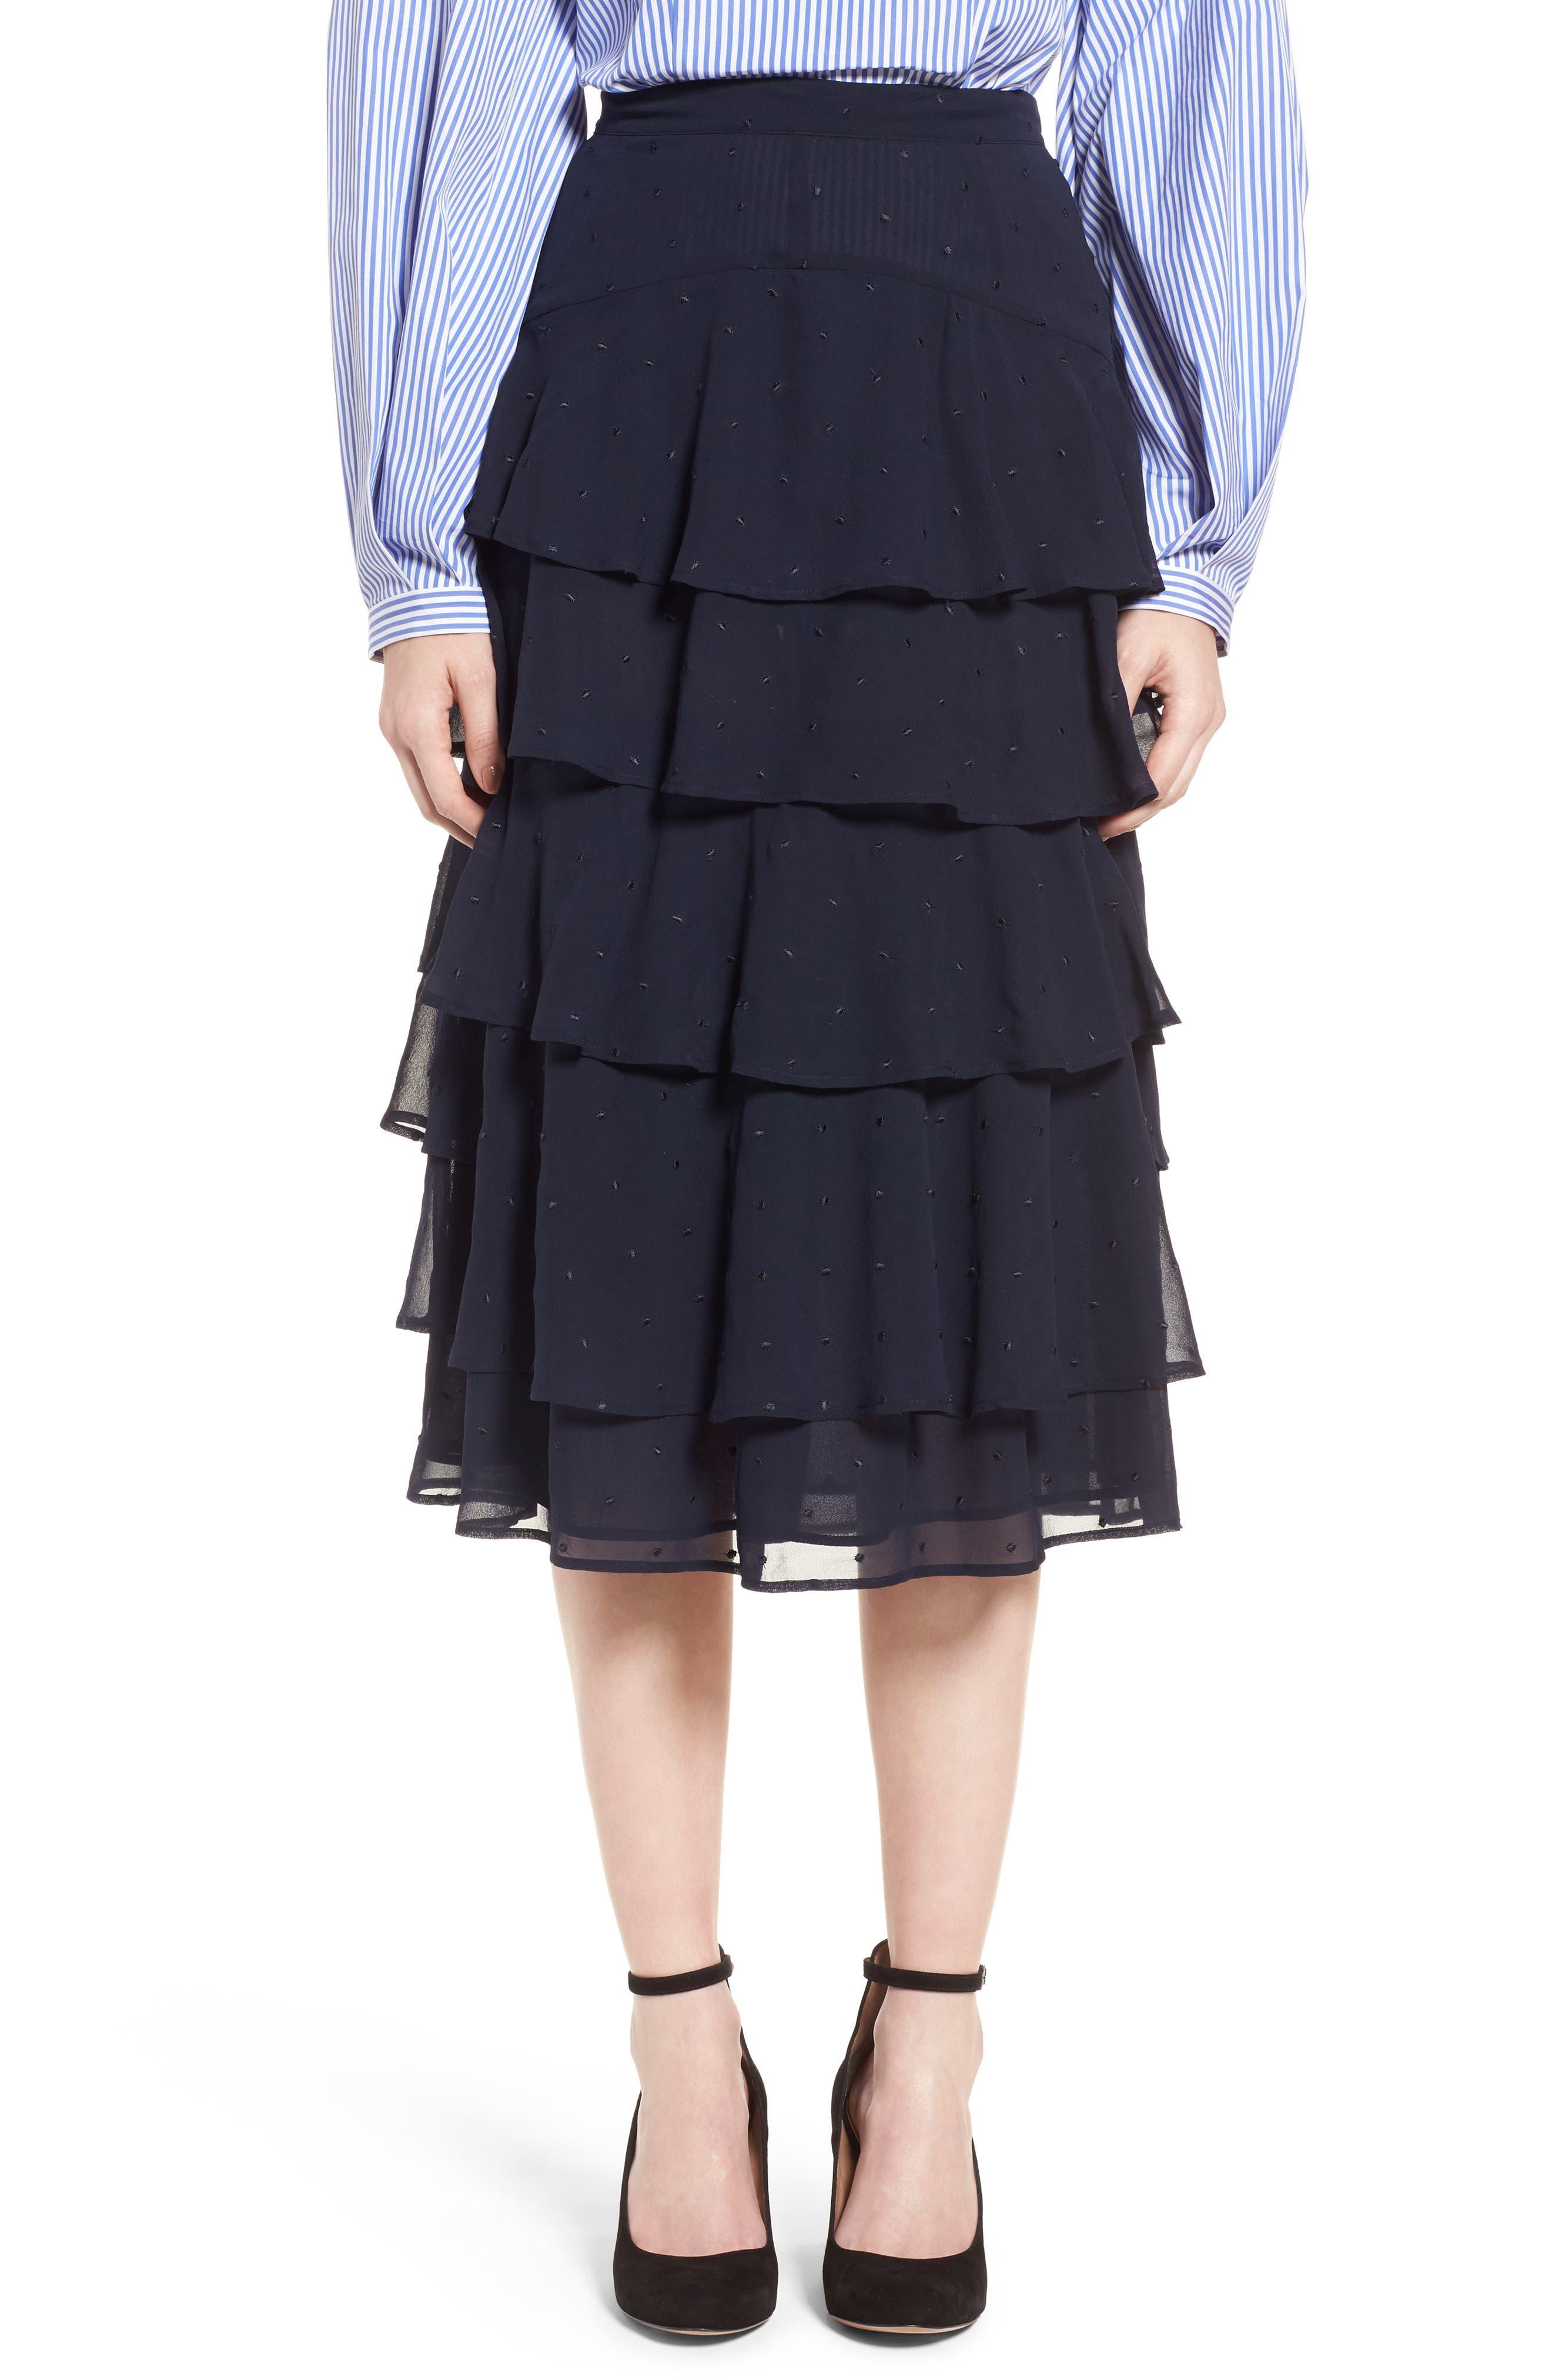 Alternate Image 1 Selected - Lewit Tiered Silk Chiffon Skirt